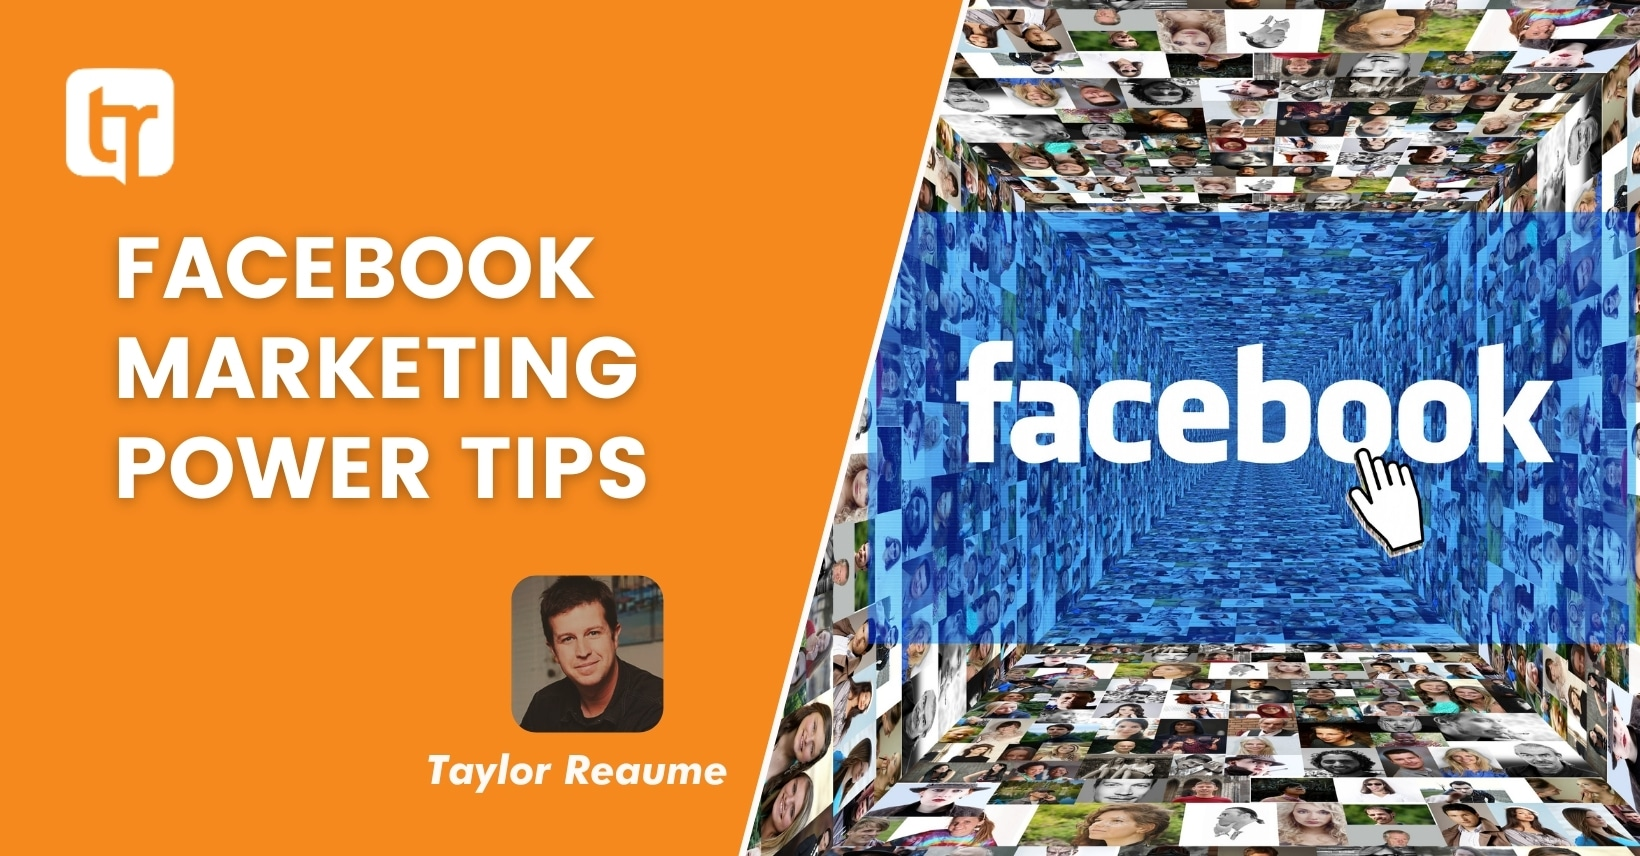 Facebook Marketing Power Tips For Santa Barbara Businesses